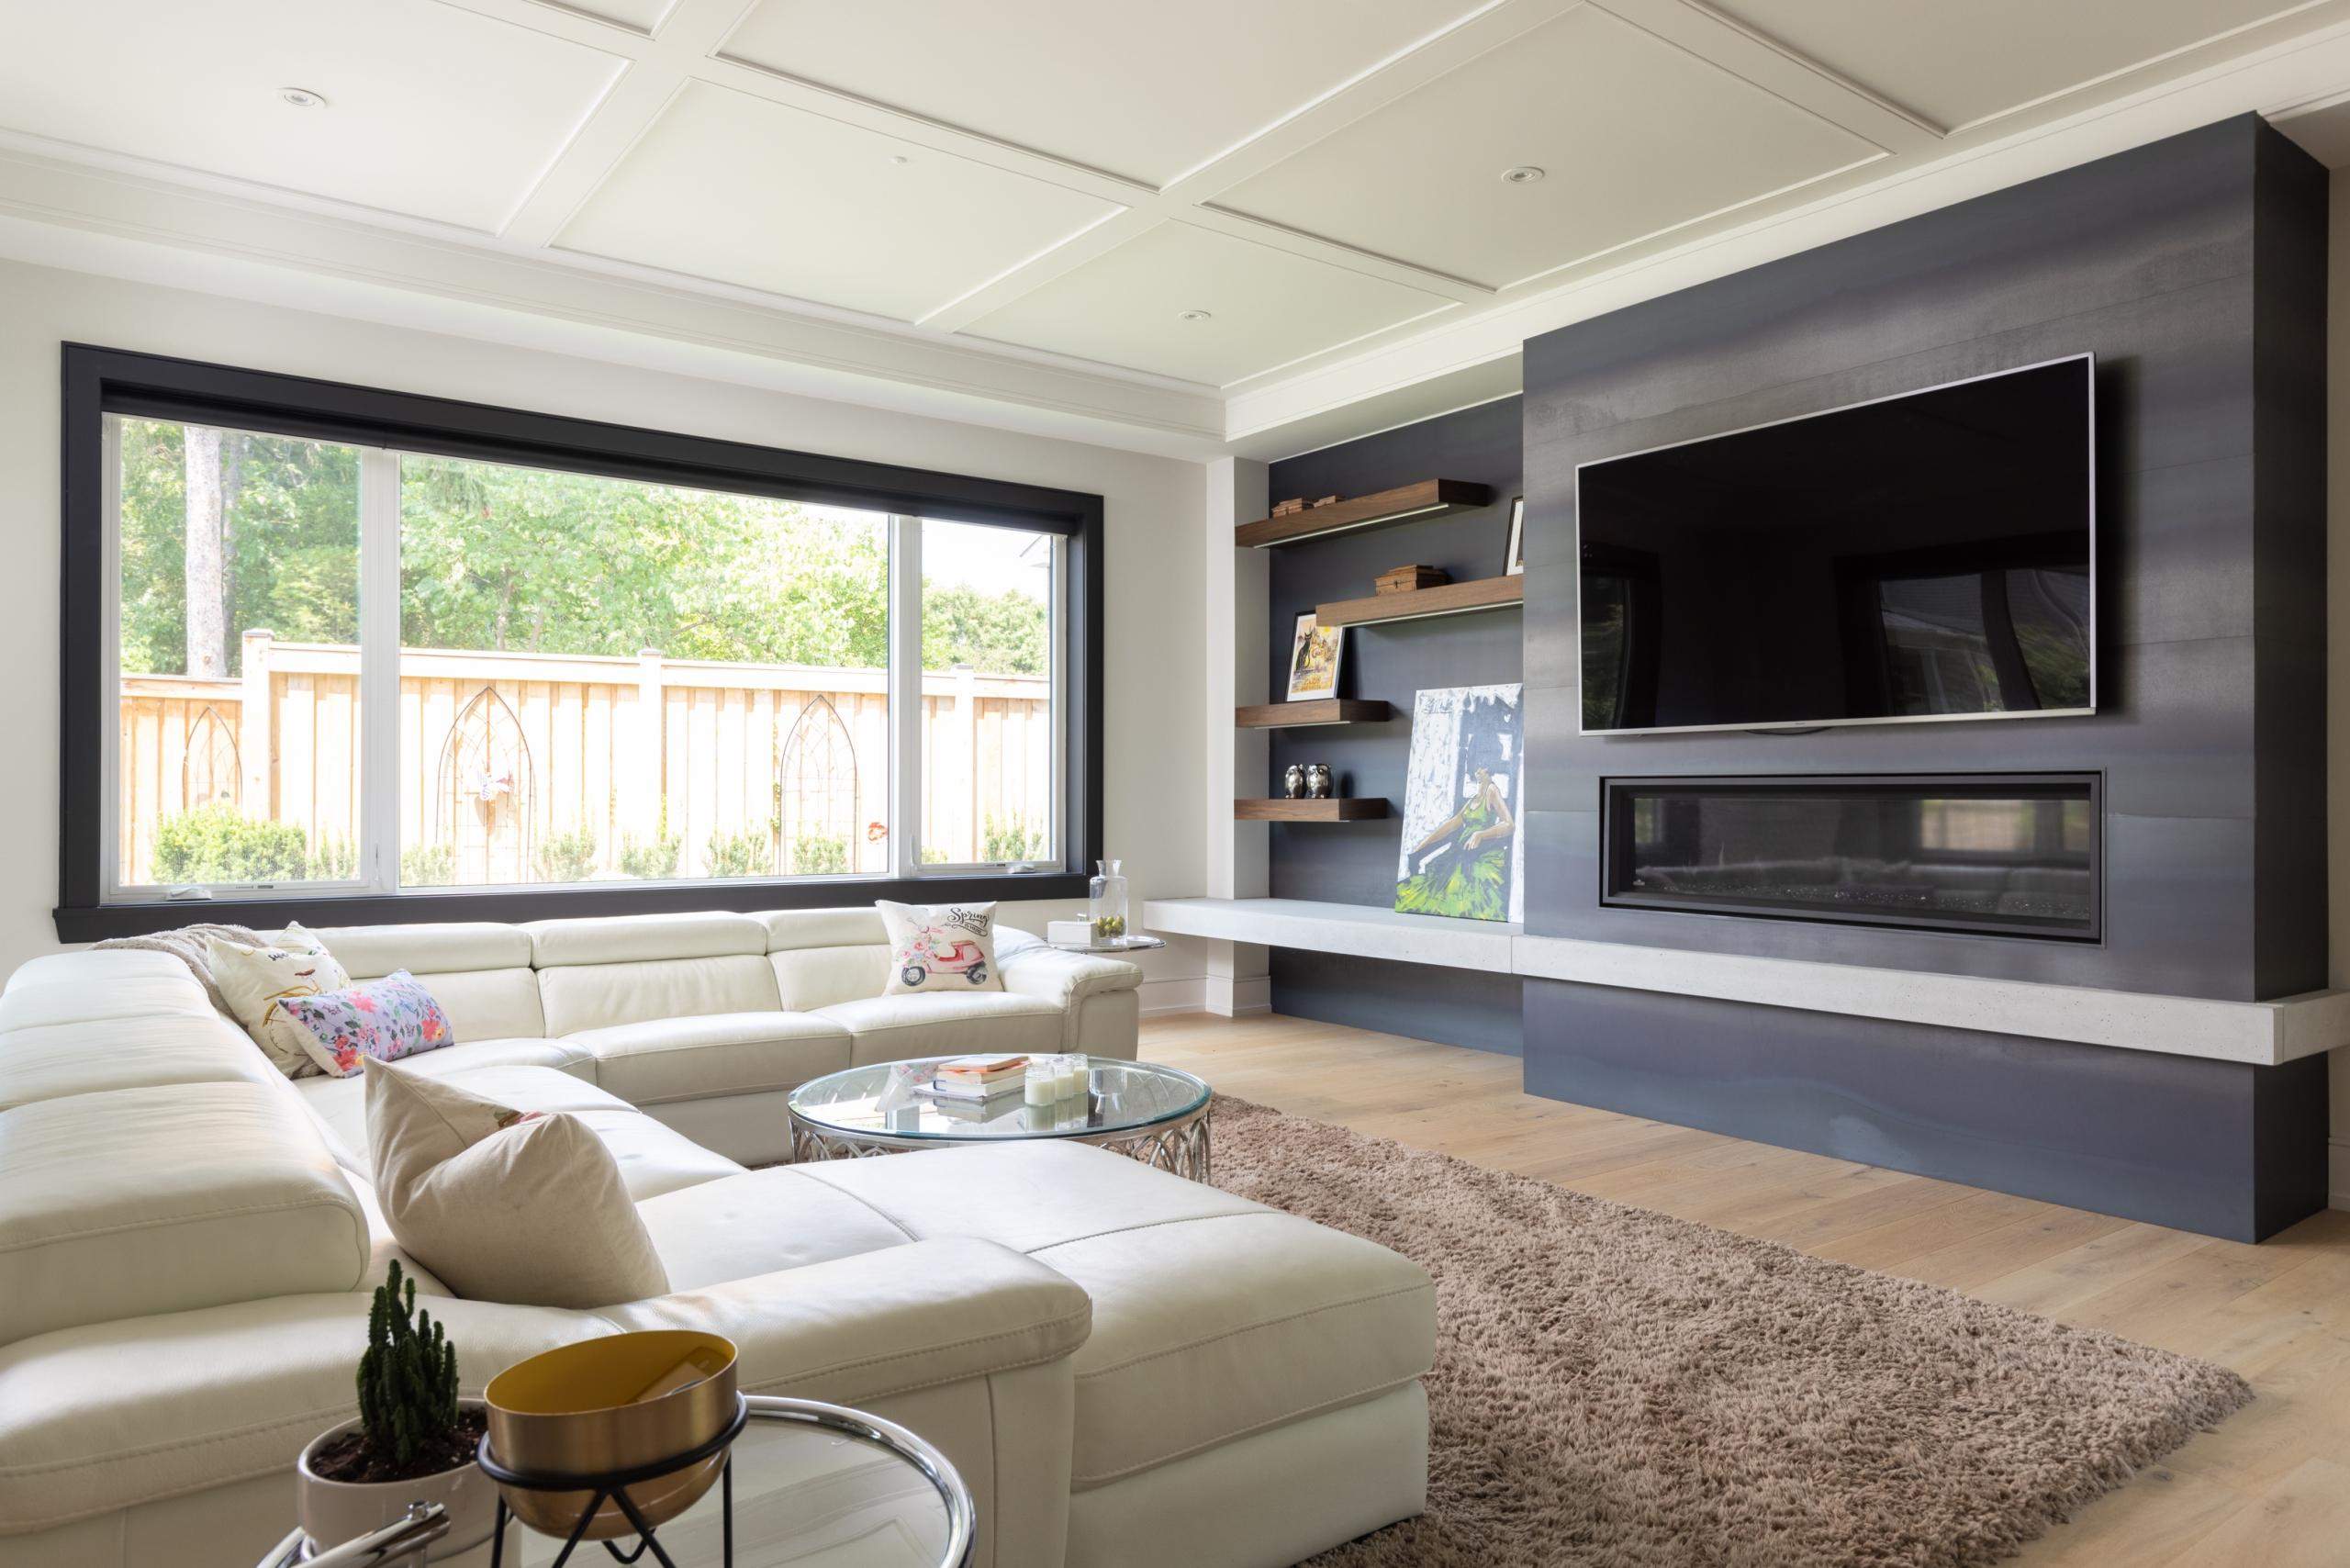 Living room featured at 489 Lakeshore Road W, Oakville at Alex Irish & Associates